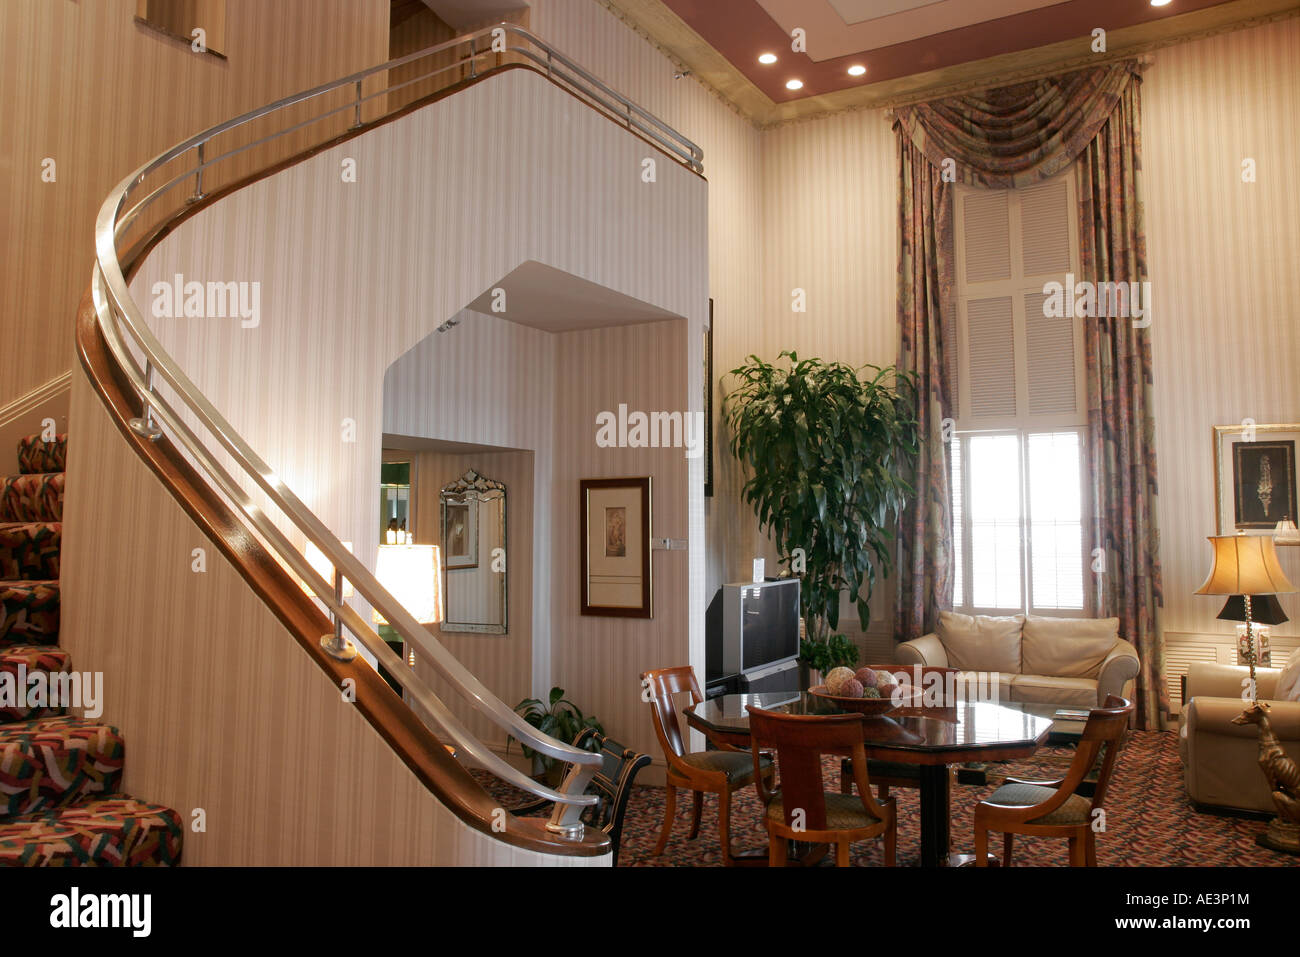 Ohio Cincinnati Hilton Netherland Plaza Presidential Suite